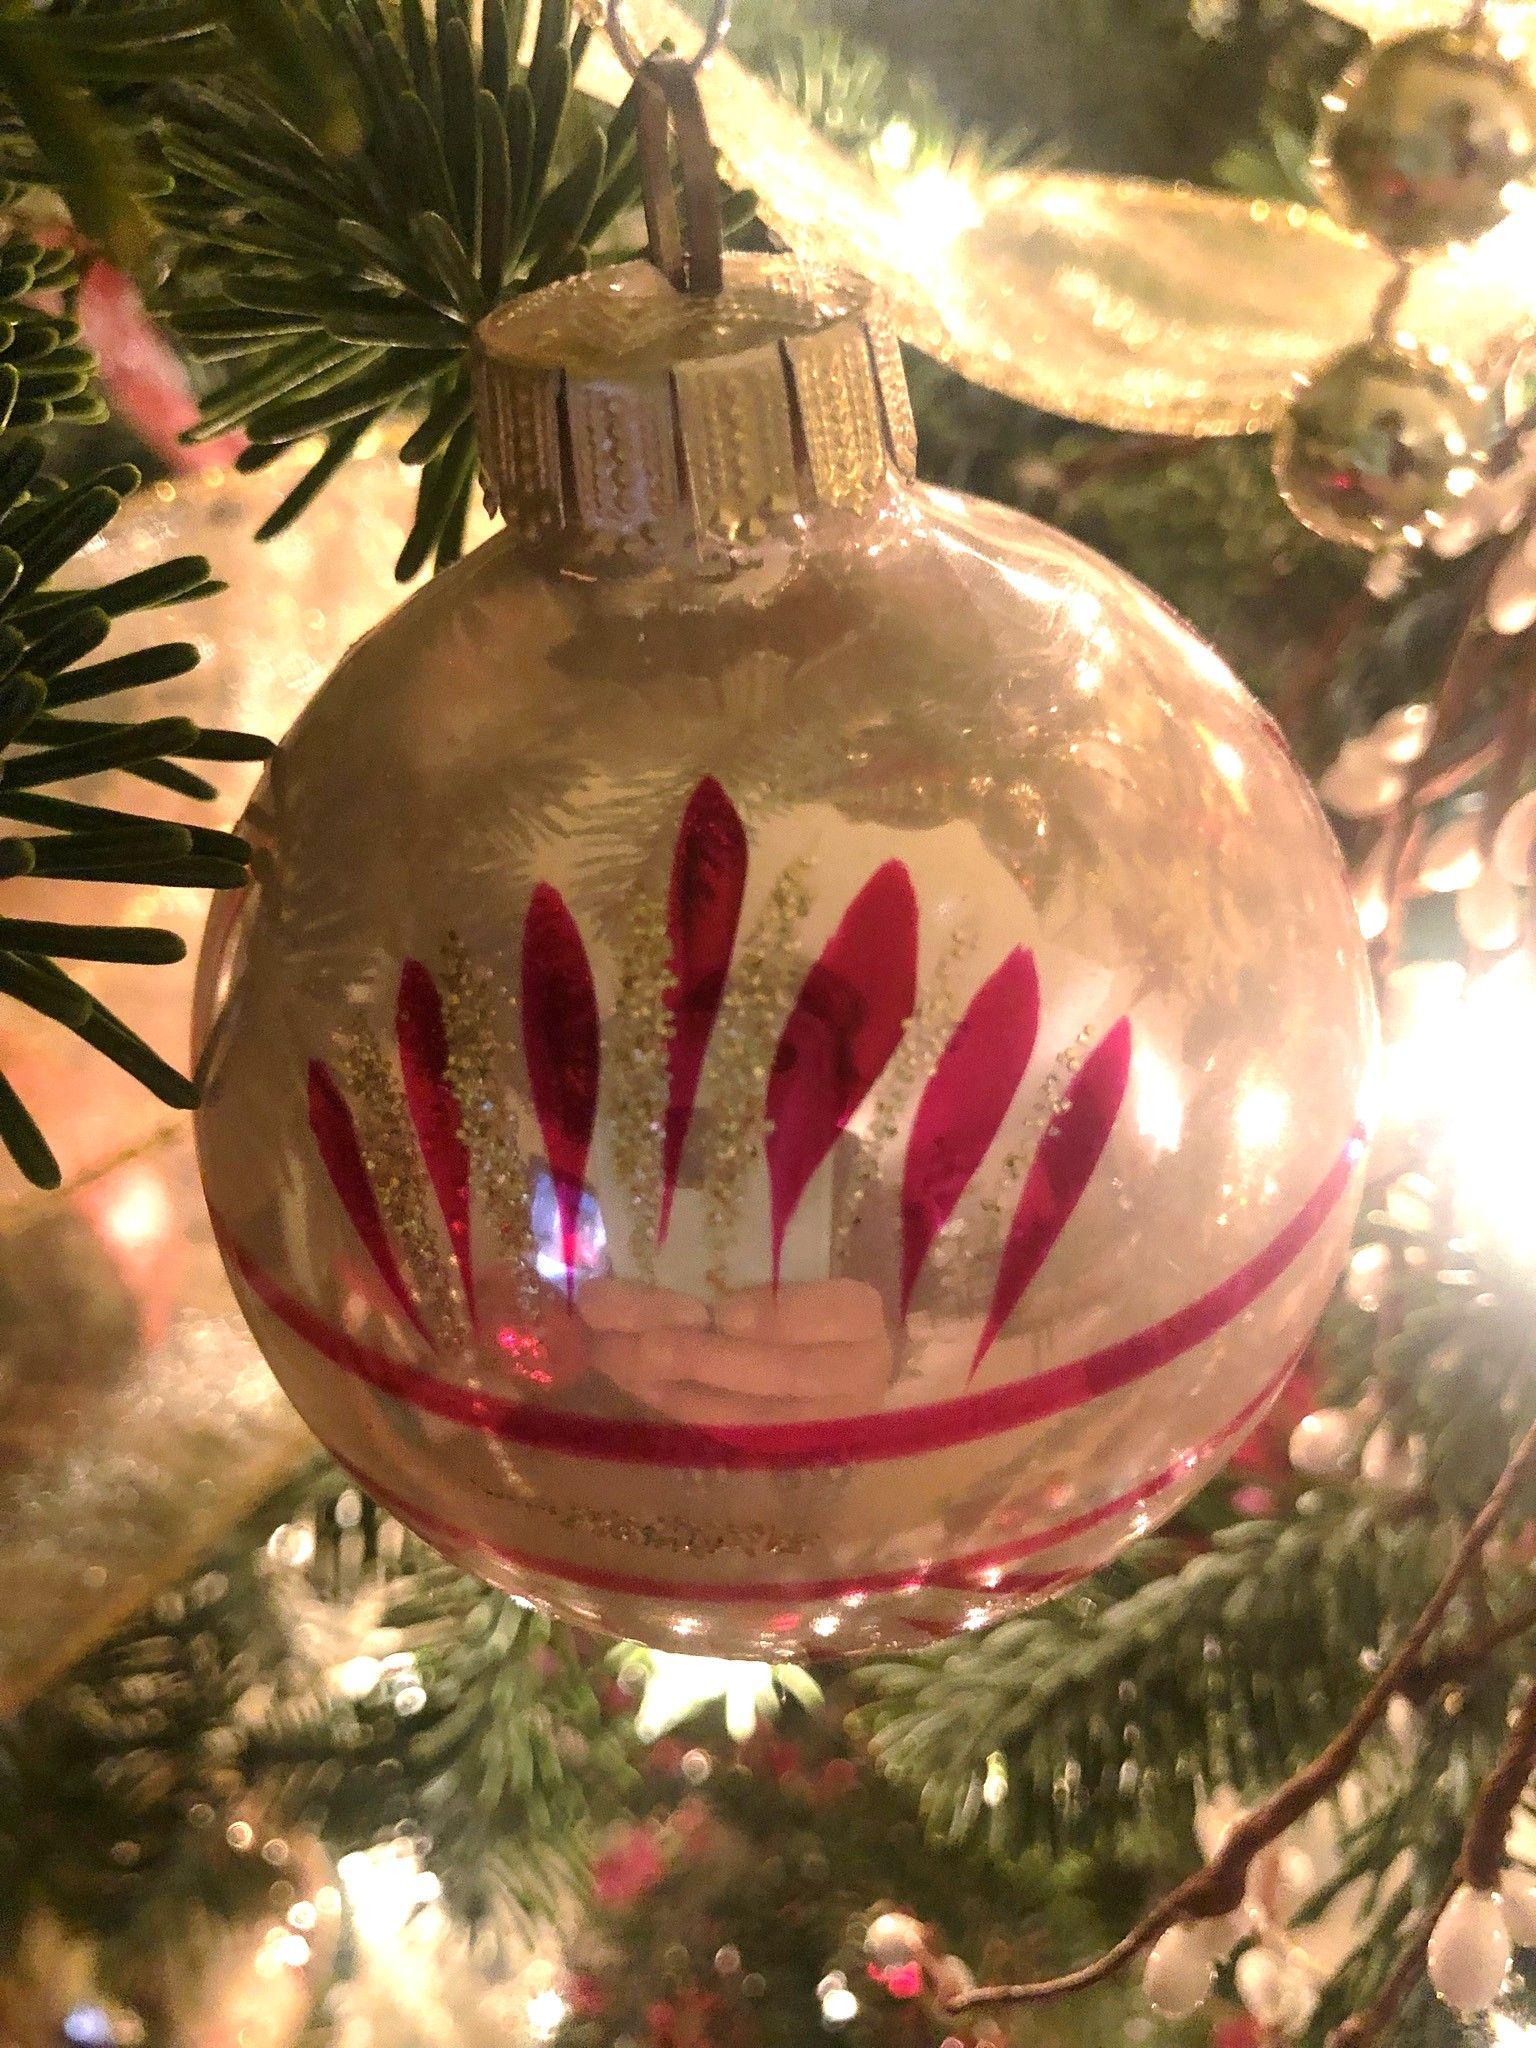 Ornament Christmas Yule Holiday Tree | Yule | Pinterest | Yule